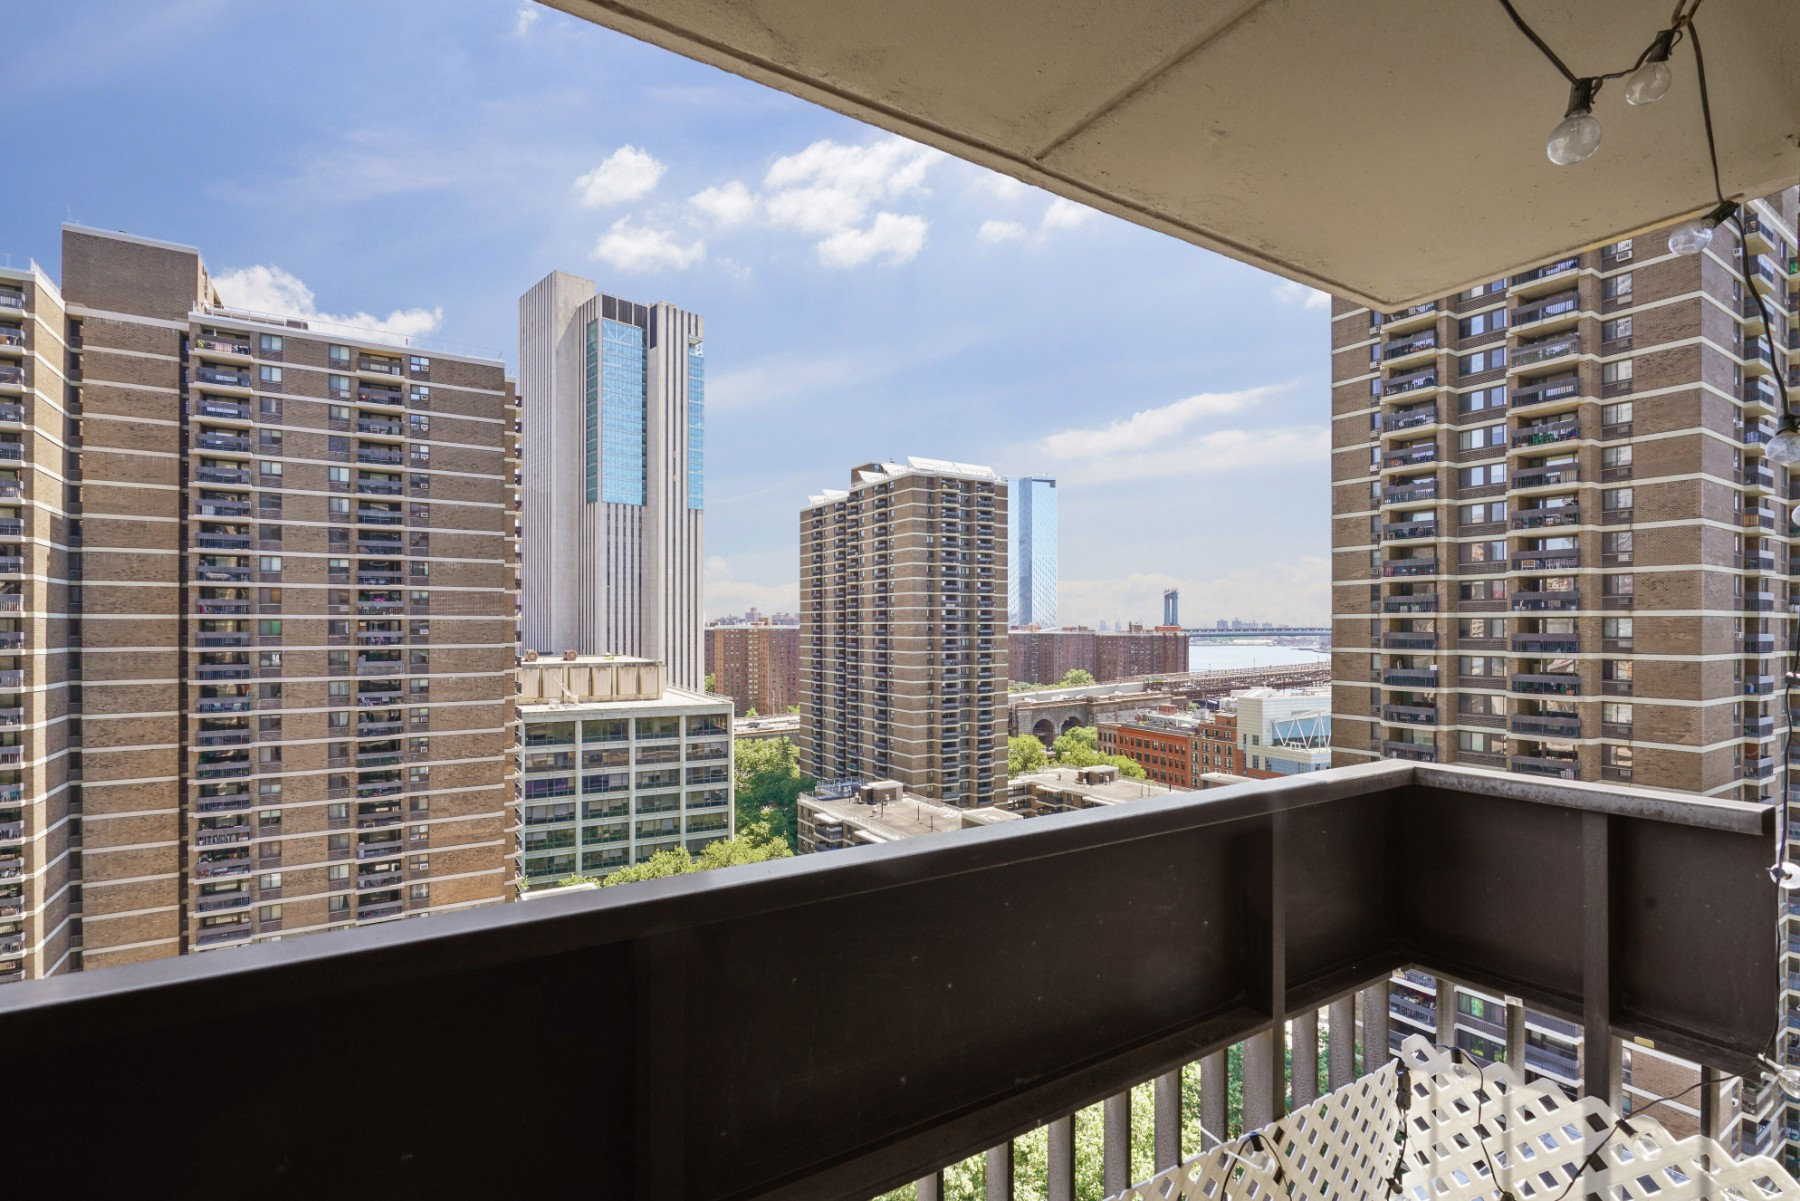 77 Fulton Street Seaport District New York NY 10038